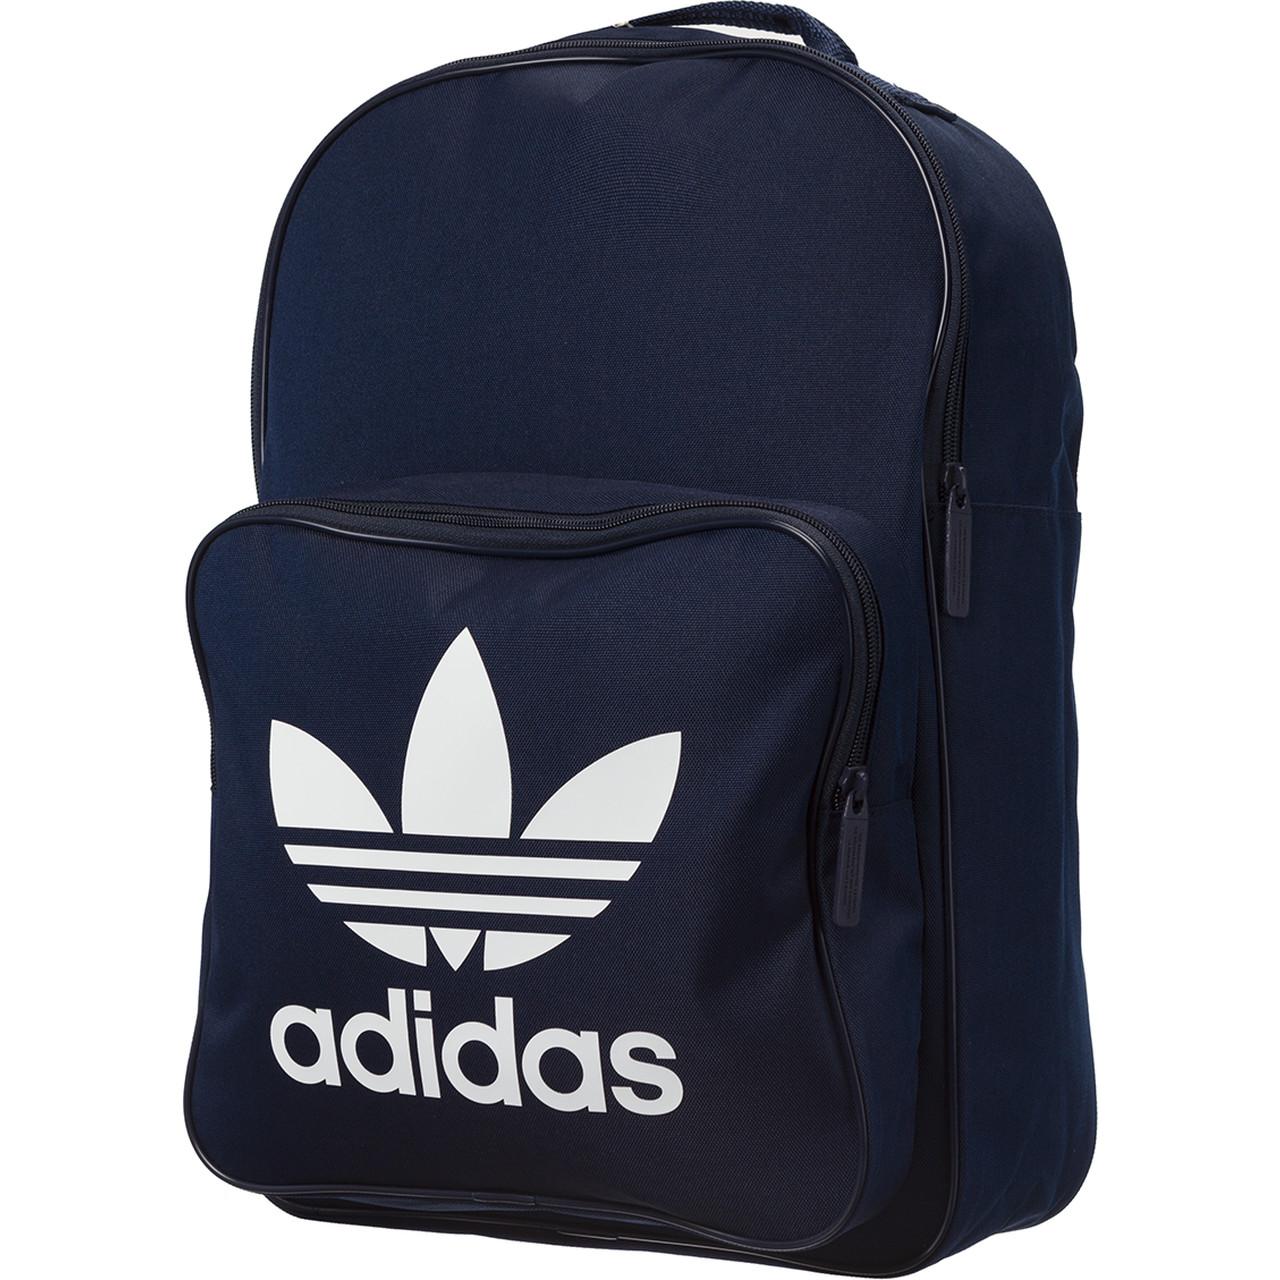 8163b536d654b Plecak adidas BP CLAS TREFOIL 724 - eastend.pl